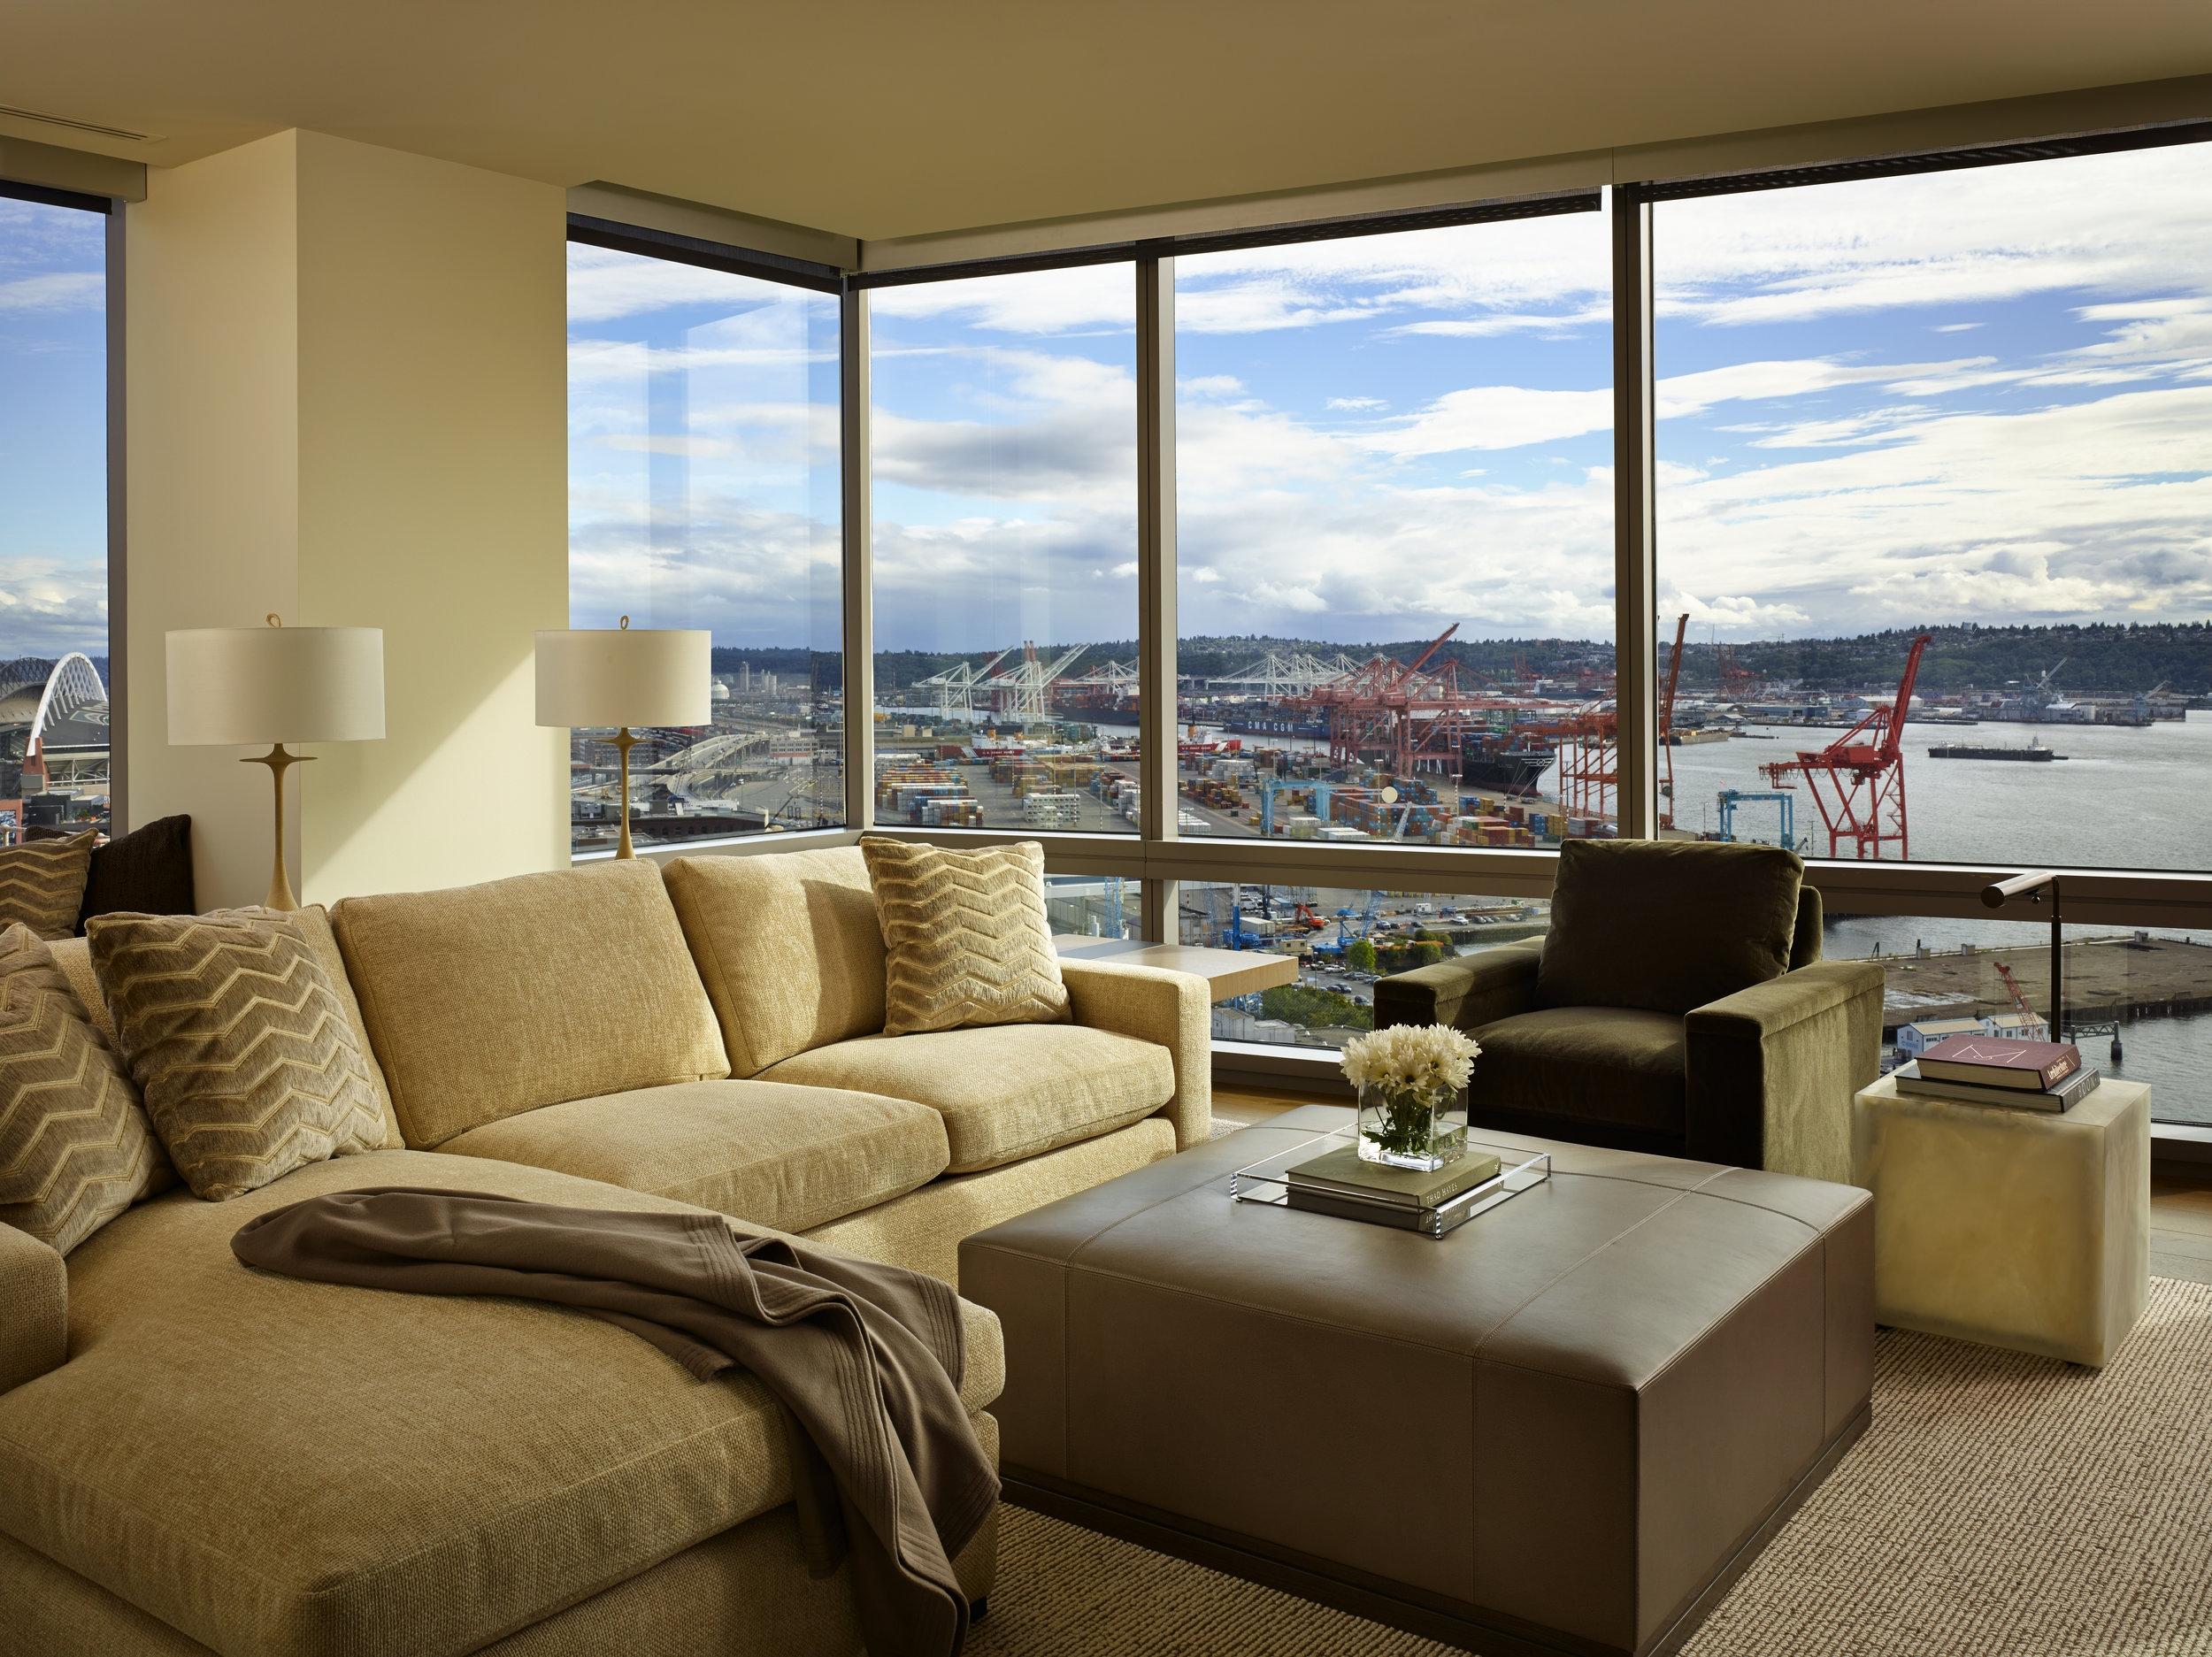 NB DESIGN GROUP Seattle Interior Design